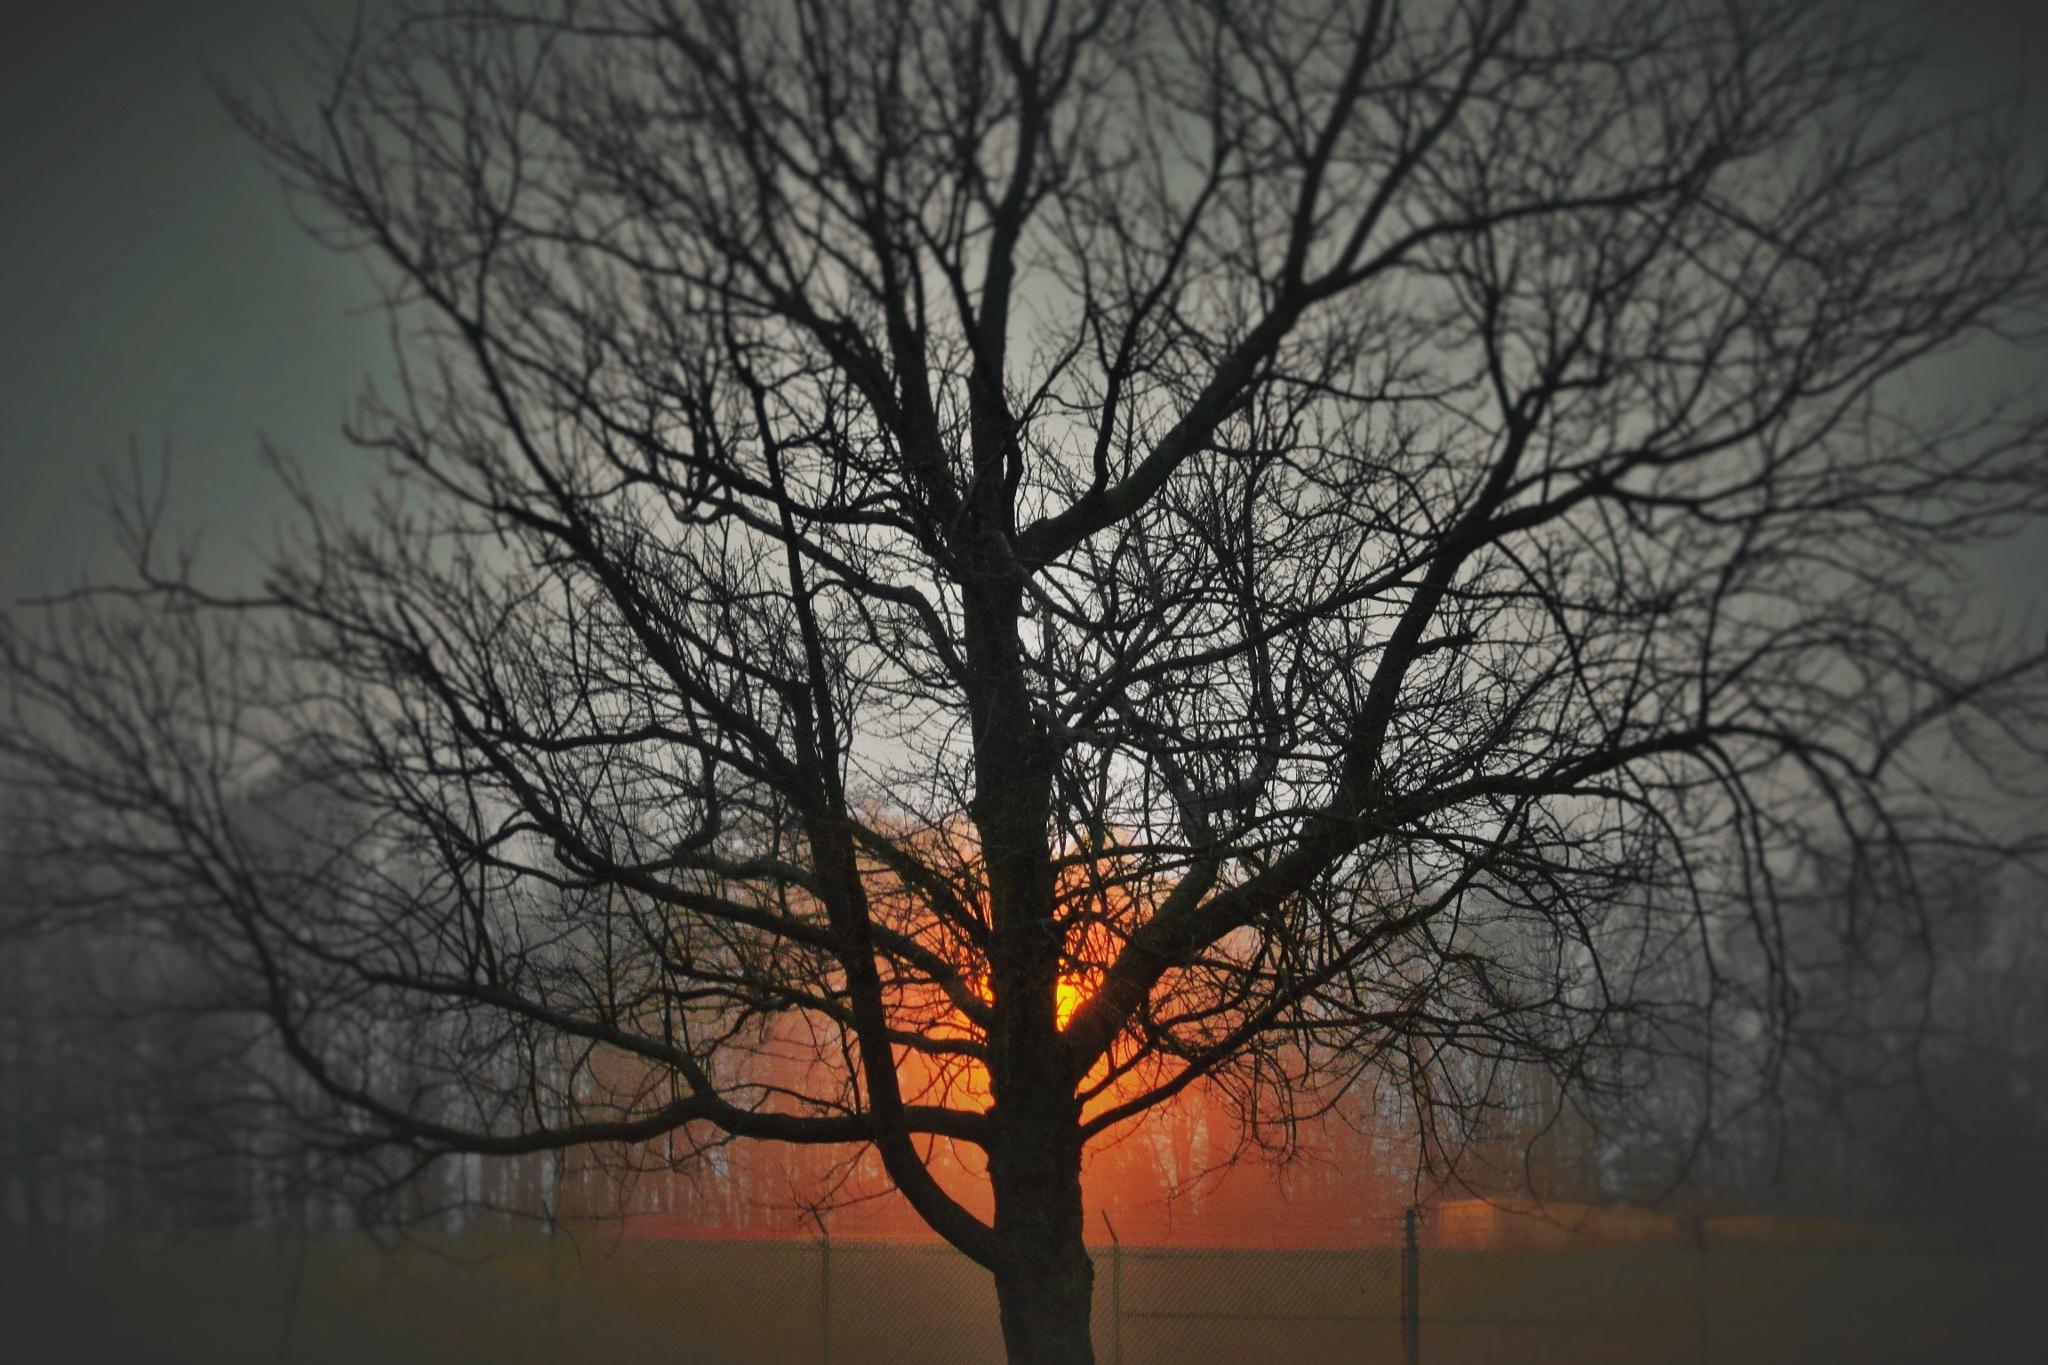 Shining Thru by brant.stevenson